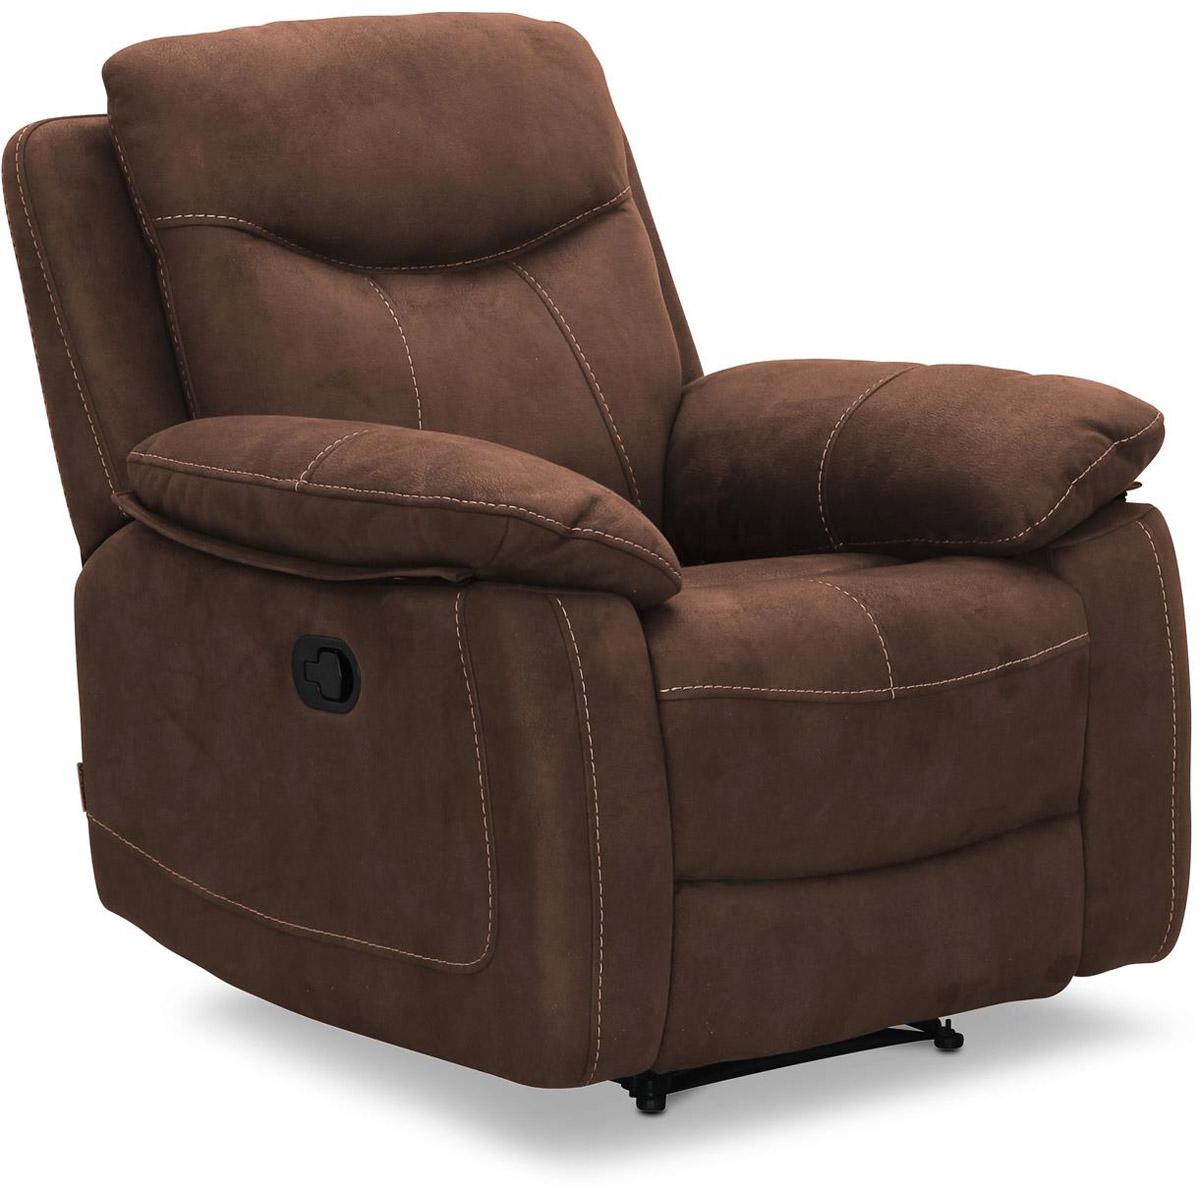 Boston fåtölj recliner brun micro vinkel